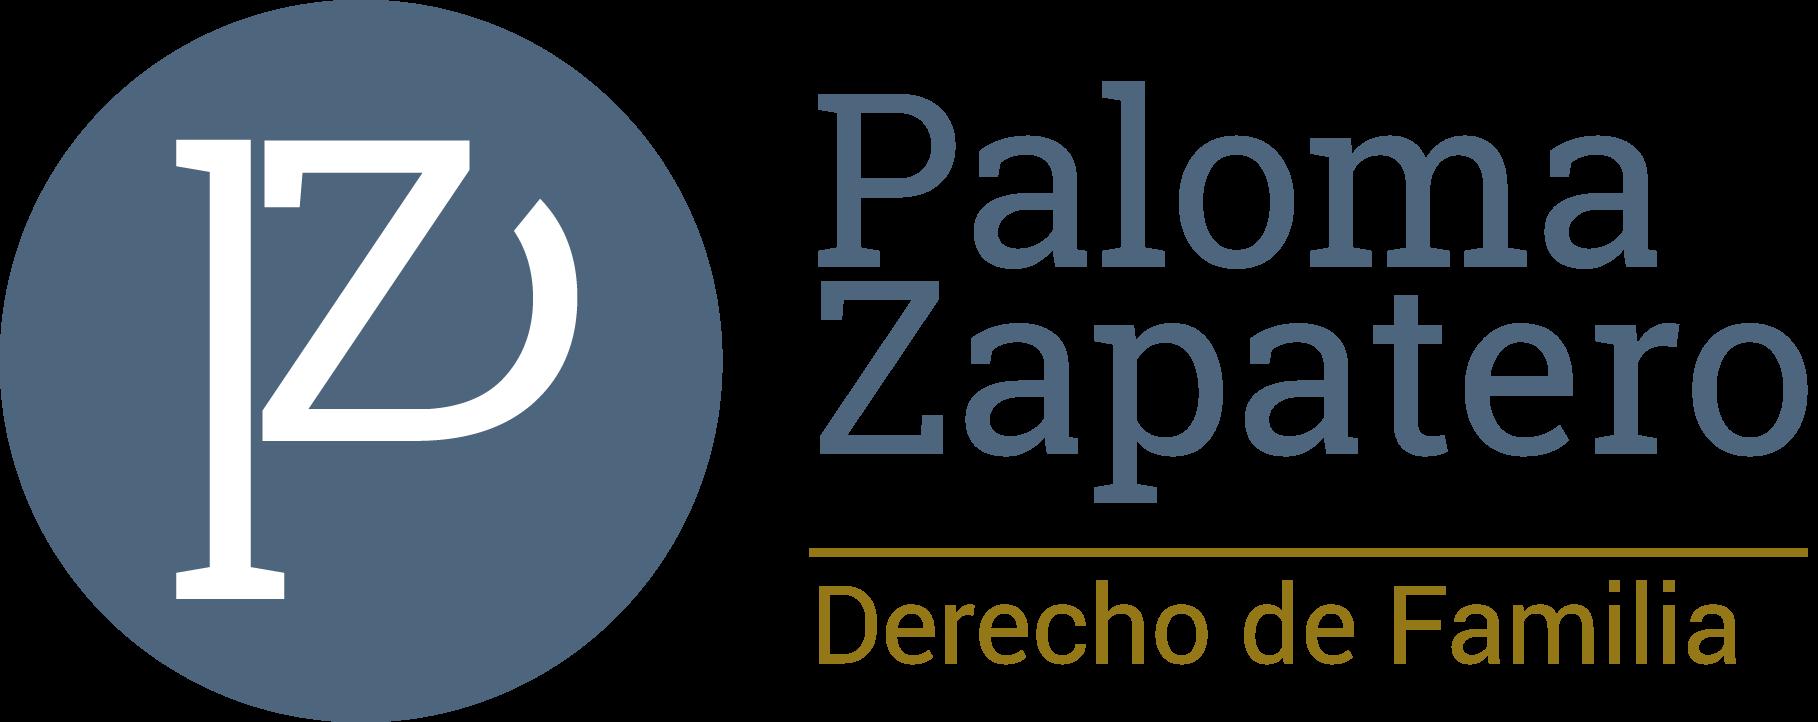 Paloma Zapatero